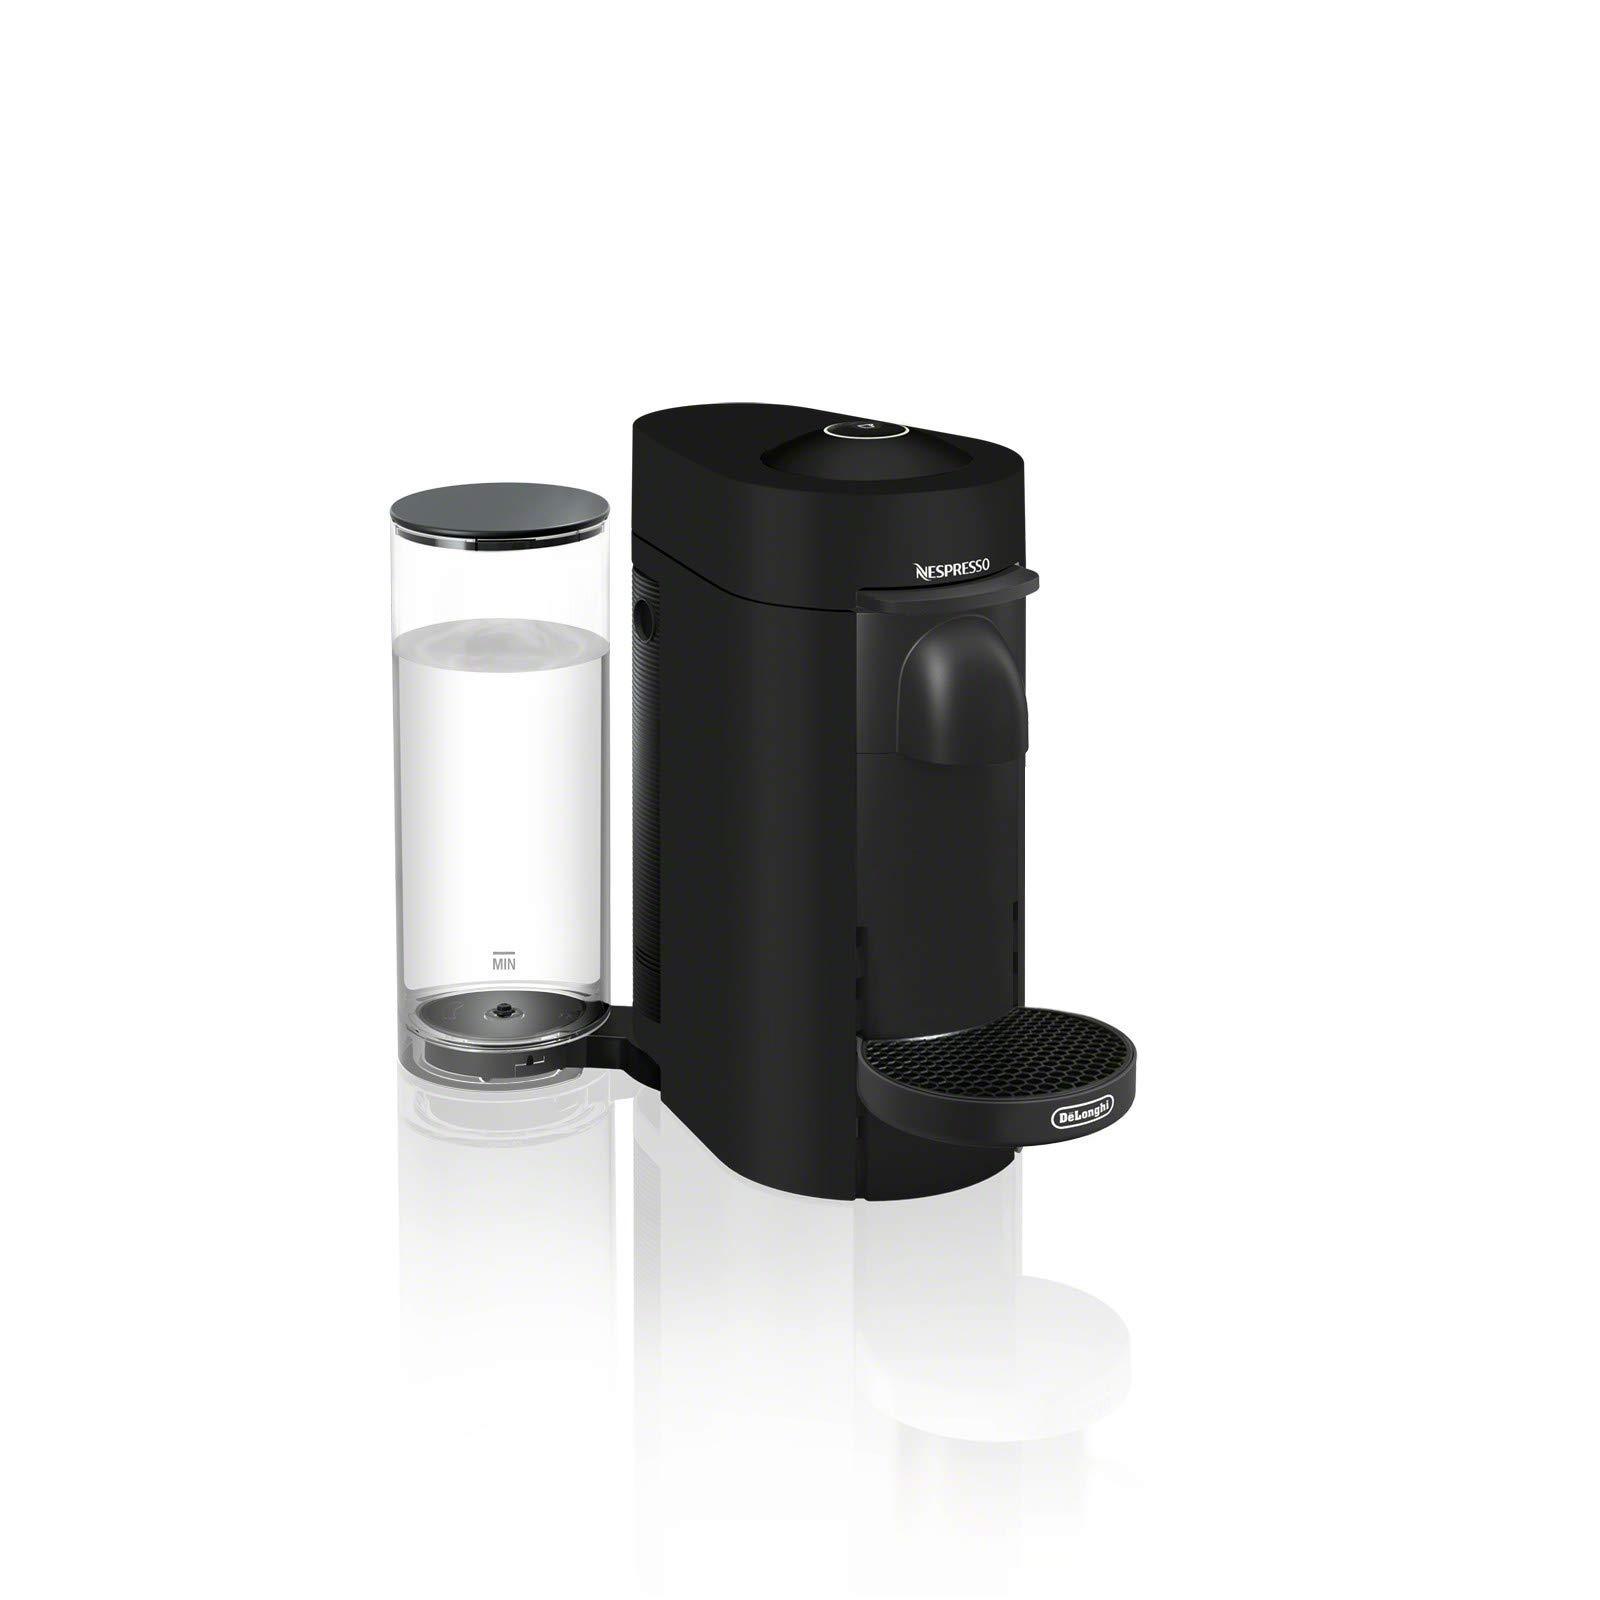 Nespresso ENV150BM VertuoPlus Coffee and Espresso Machine by De'Longhi, Black Matte (Renewed) by Nestle Nespresso